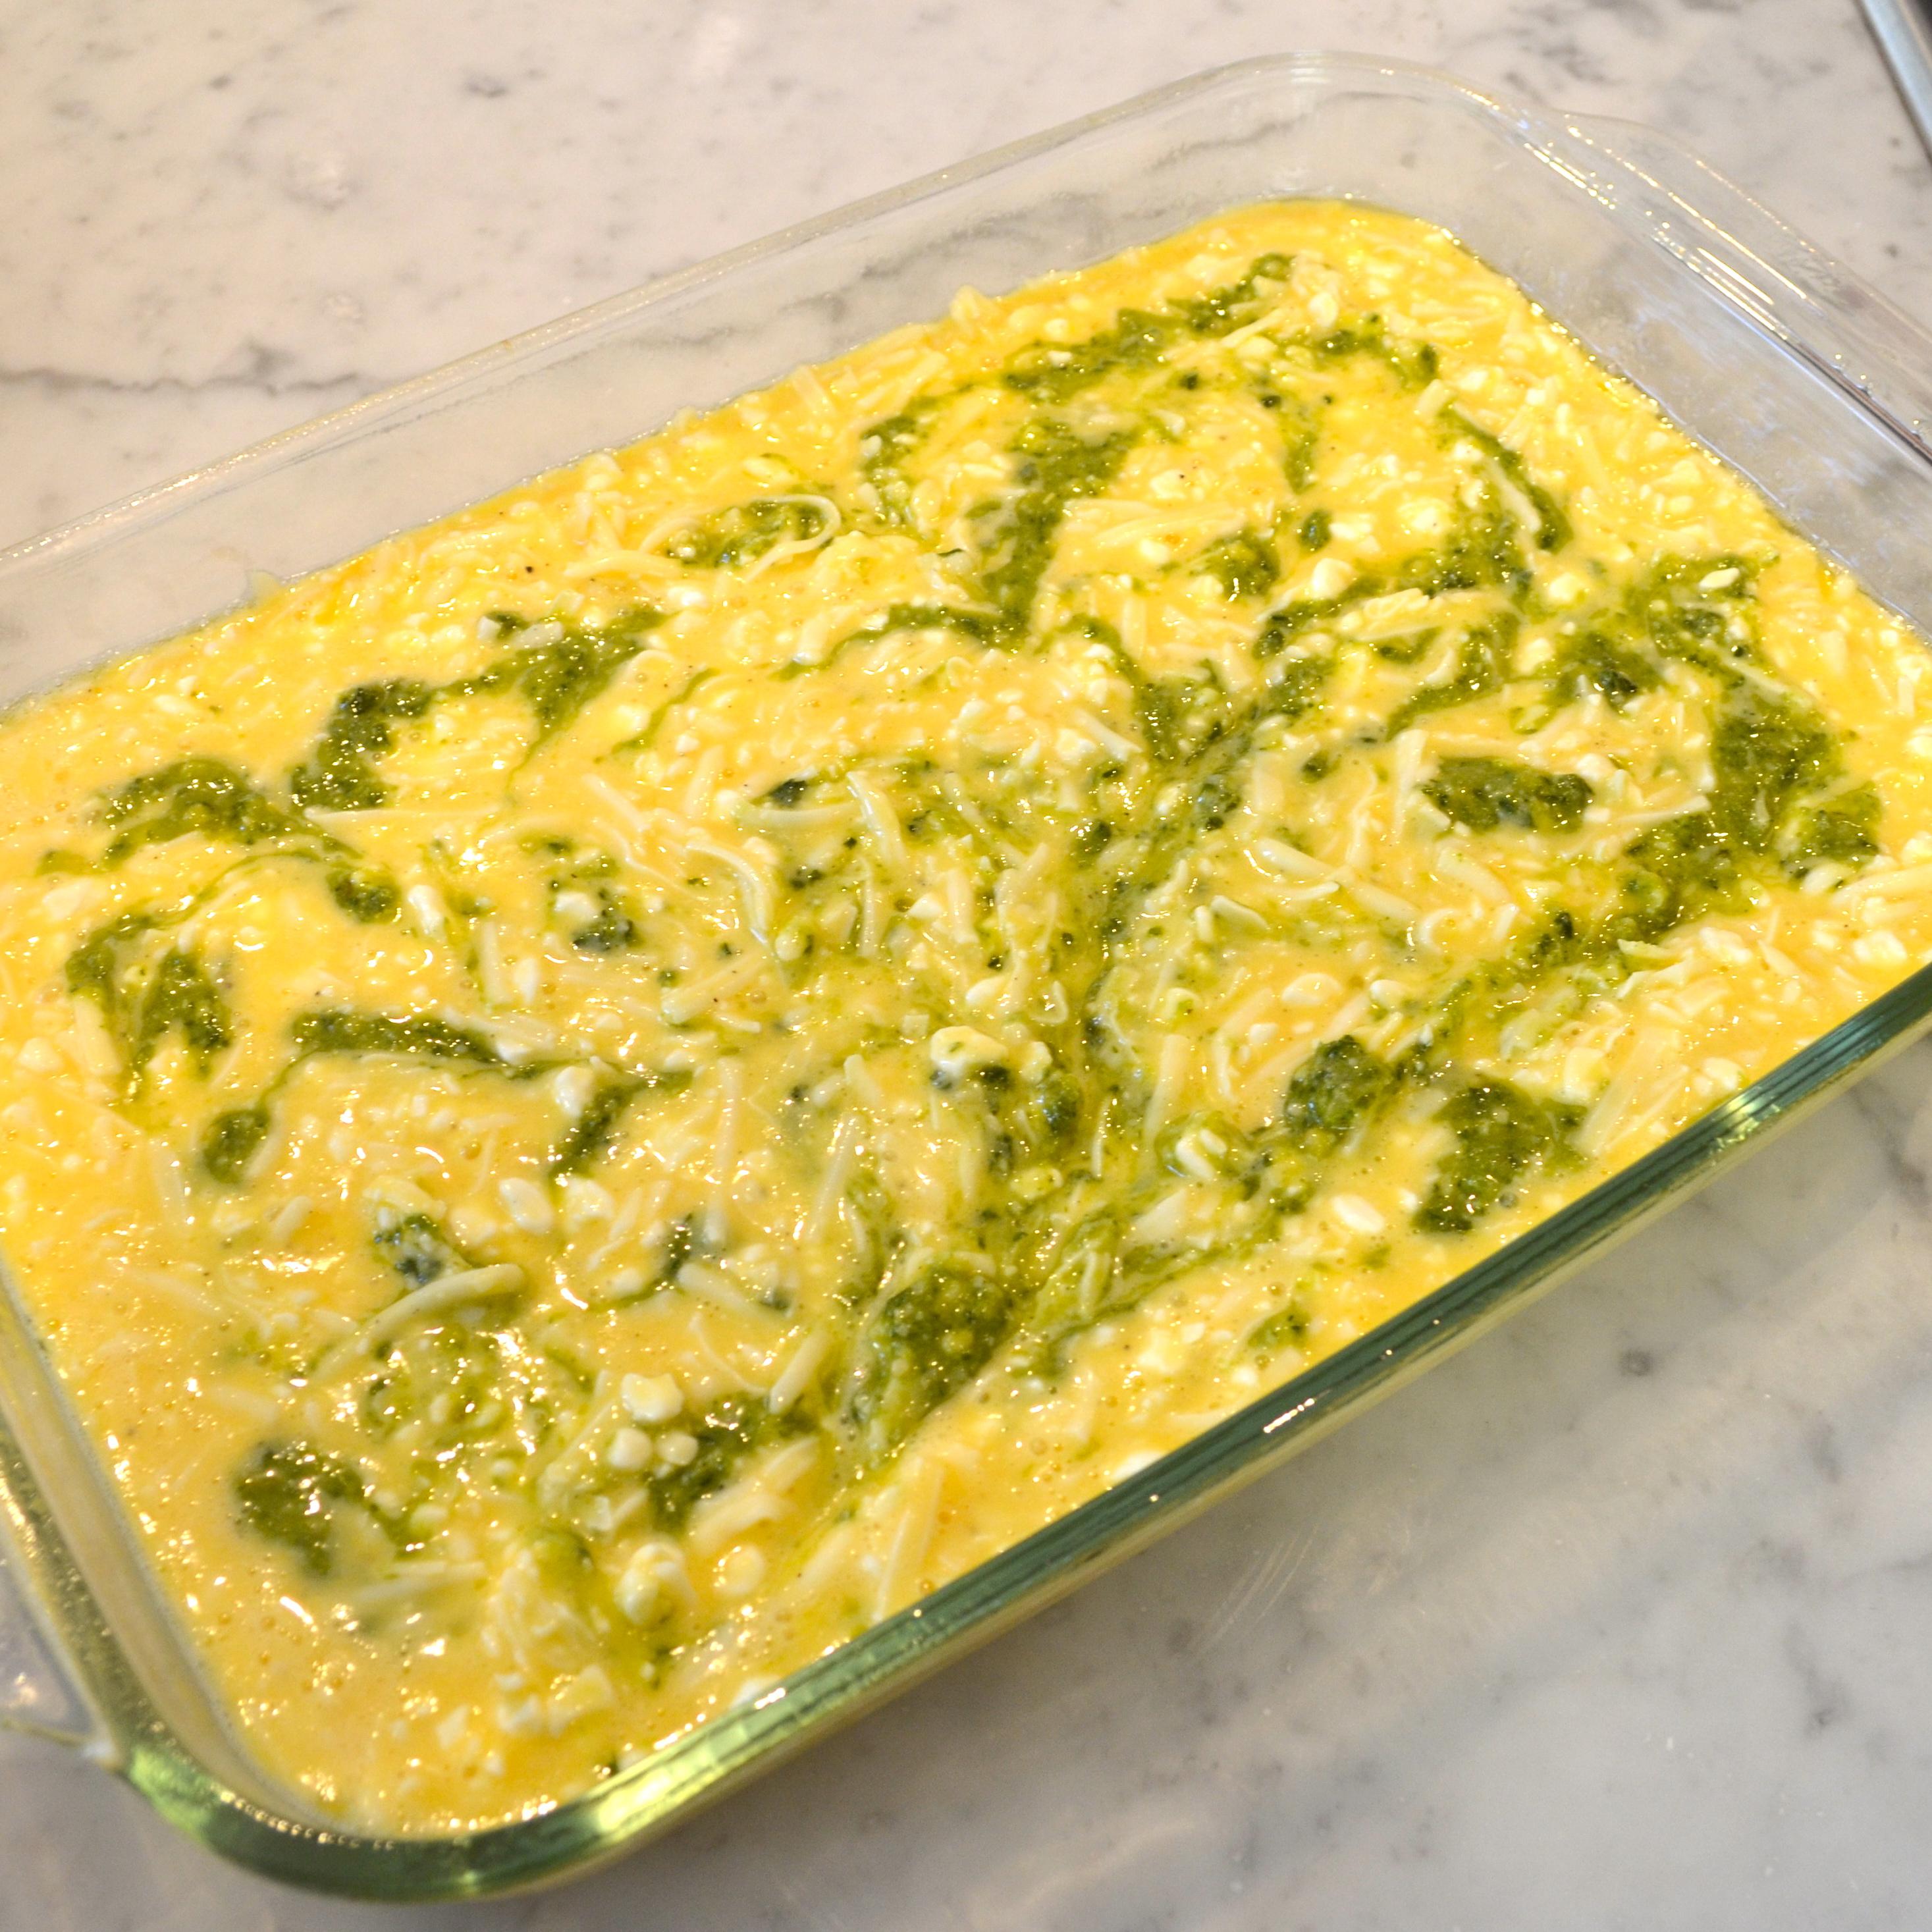 Garden Vegetable Crustless Quiche: ITALIAN STYLE CRUSTLESS QUICHE RECIPE